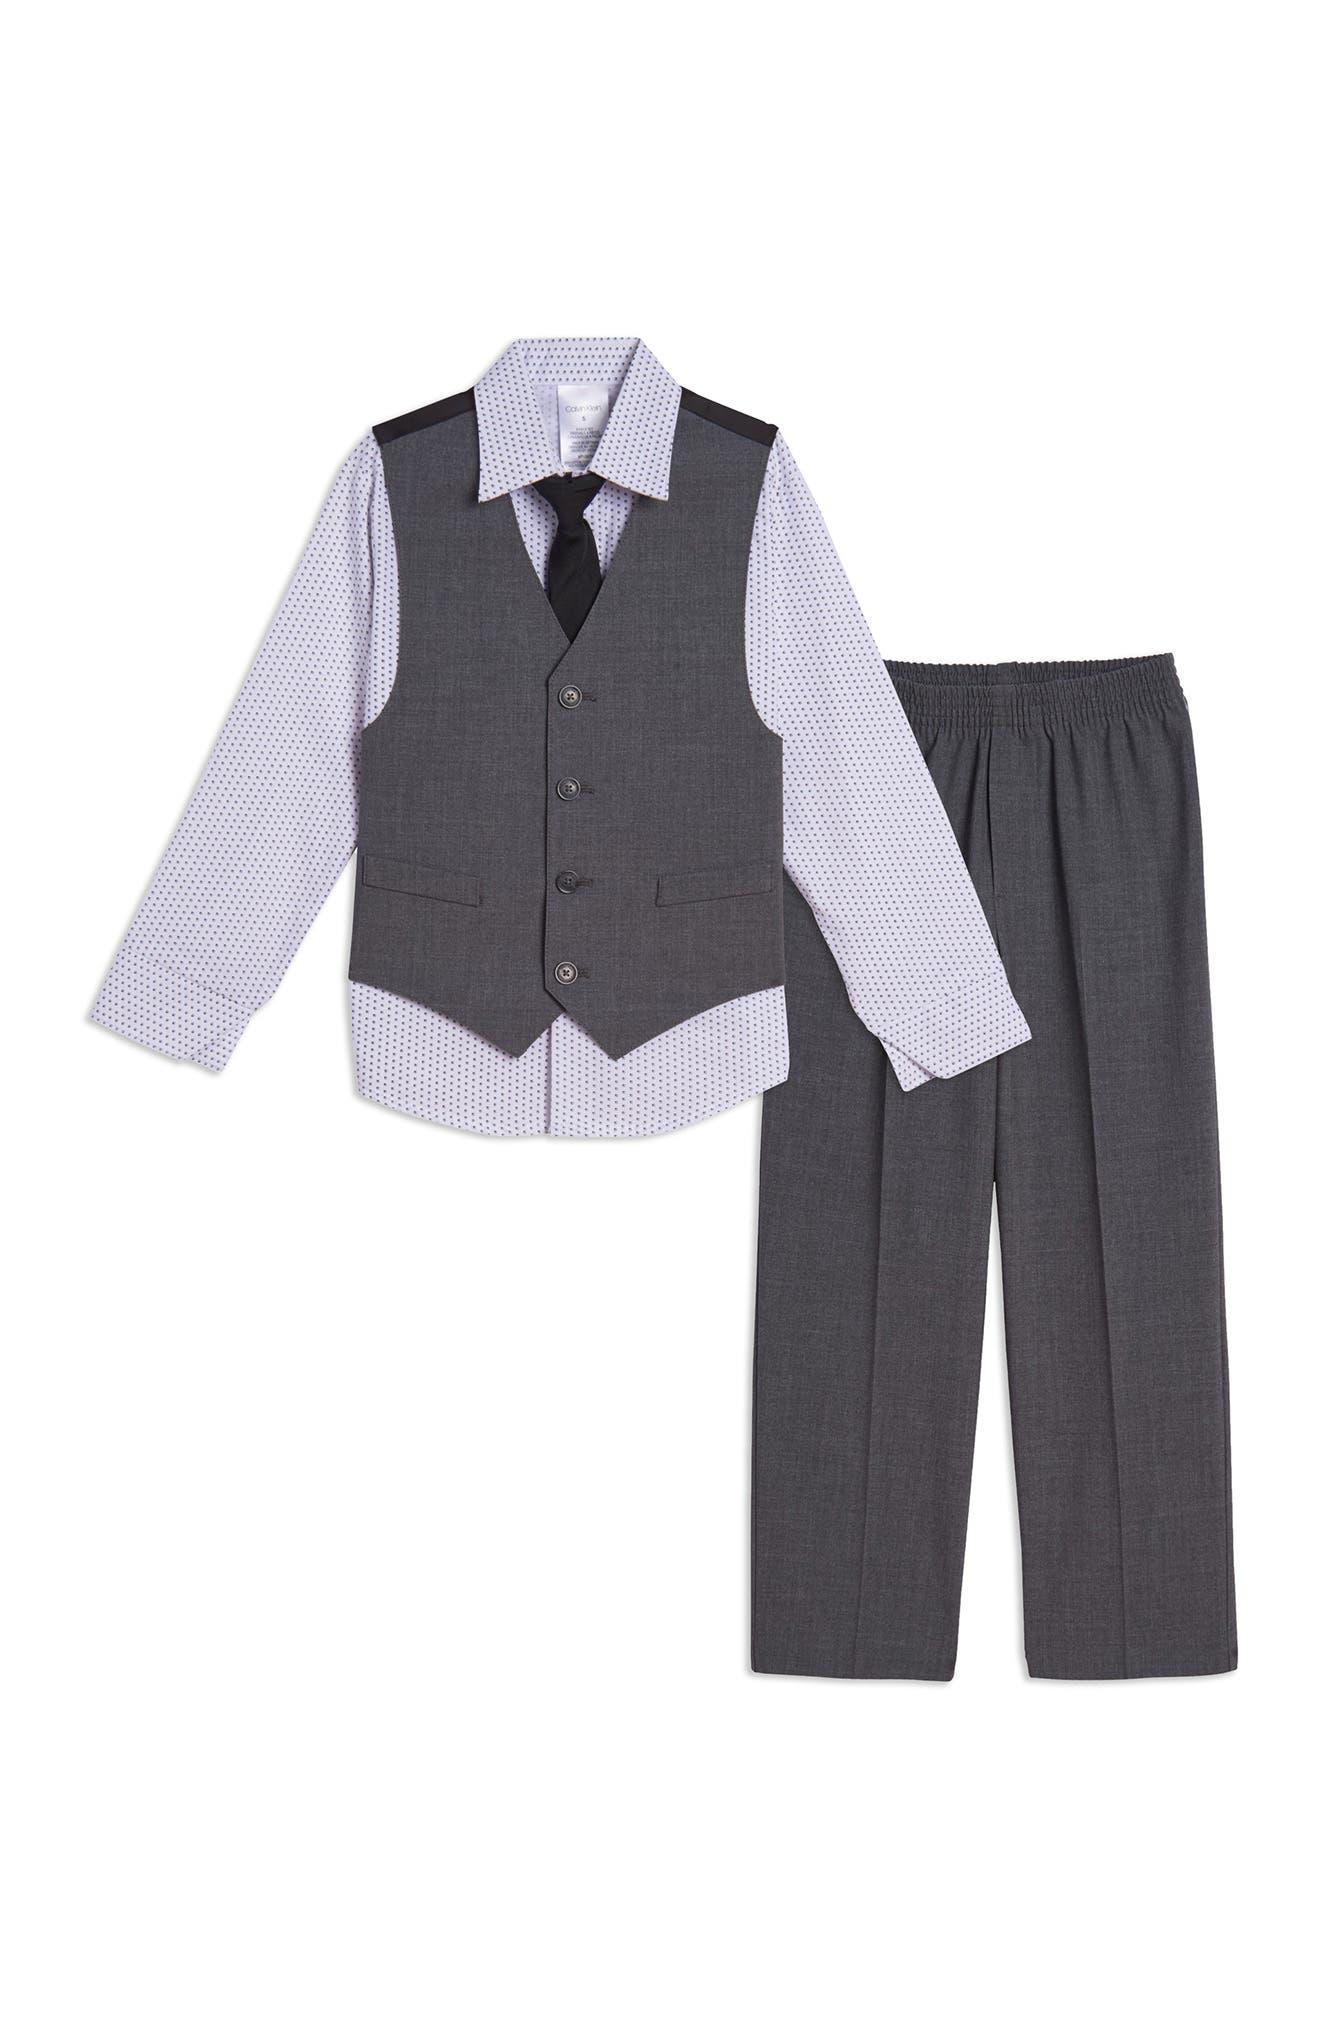 Image of Calvin Klein Bi Stretch Vest 4-Piece Set